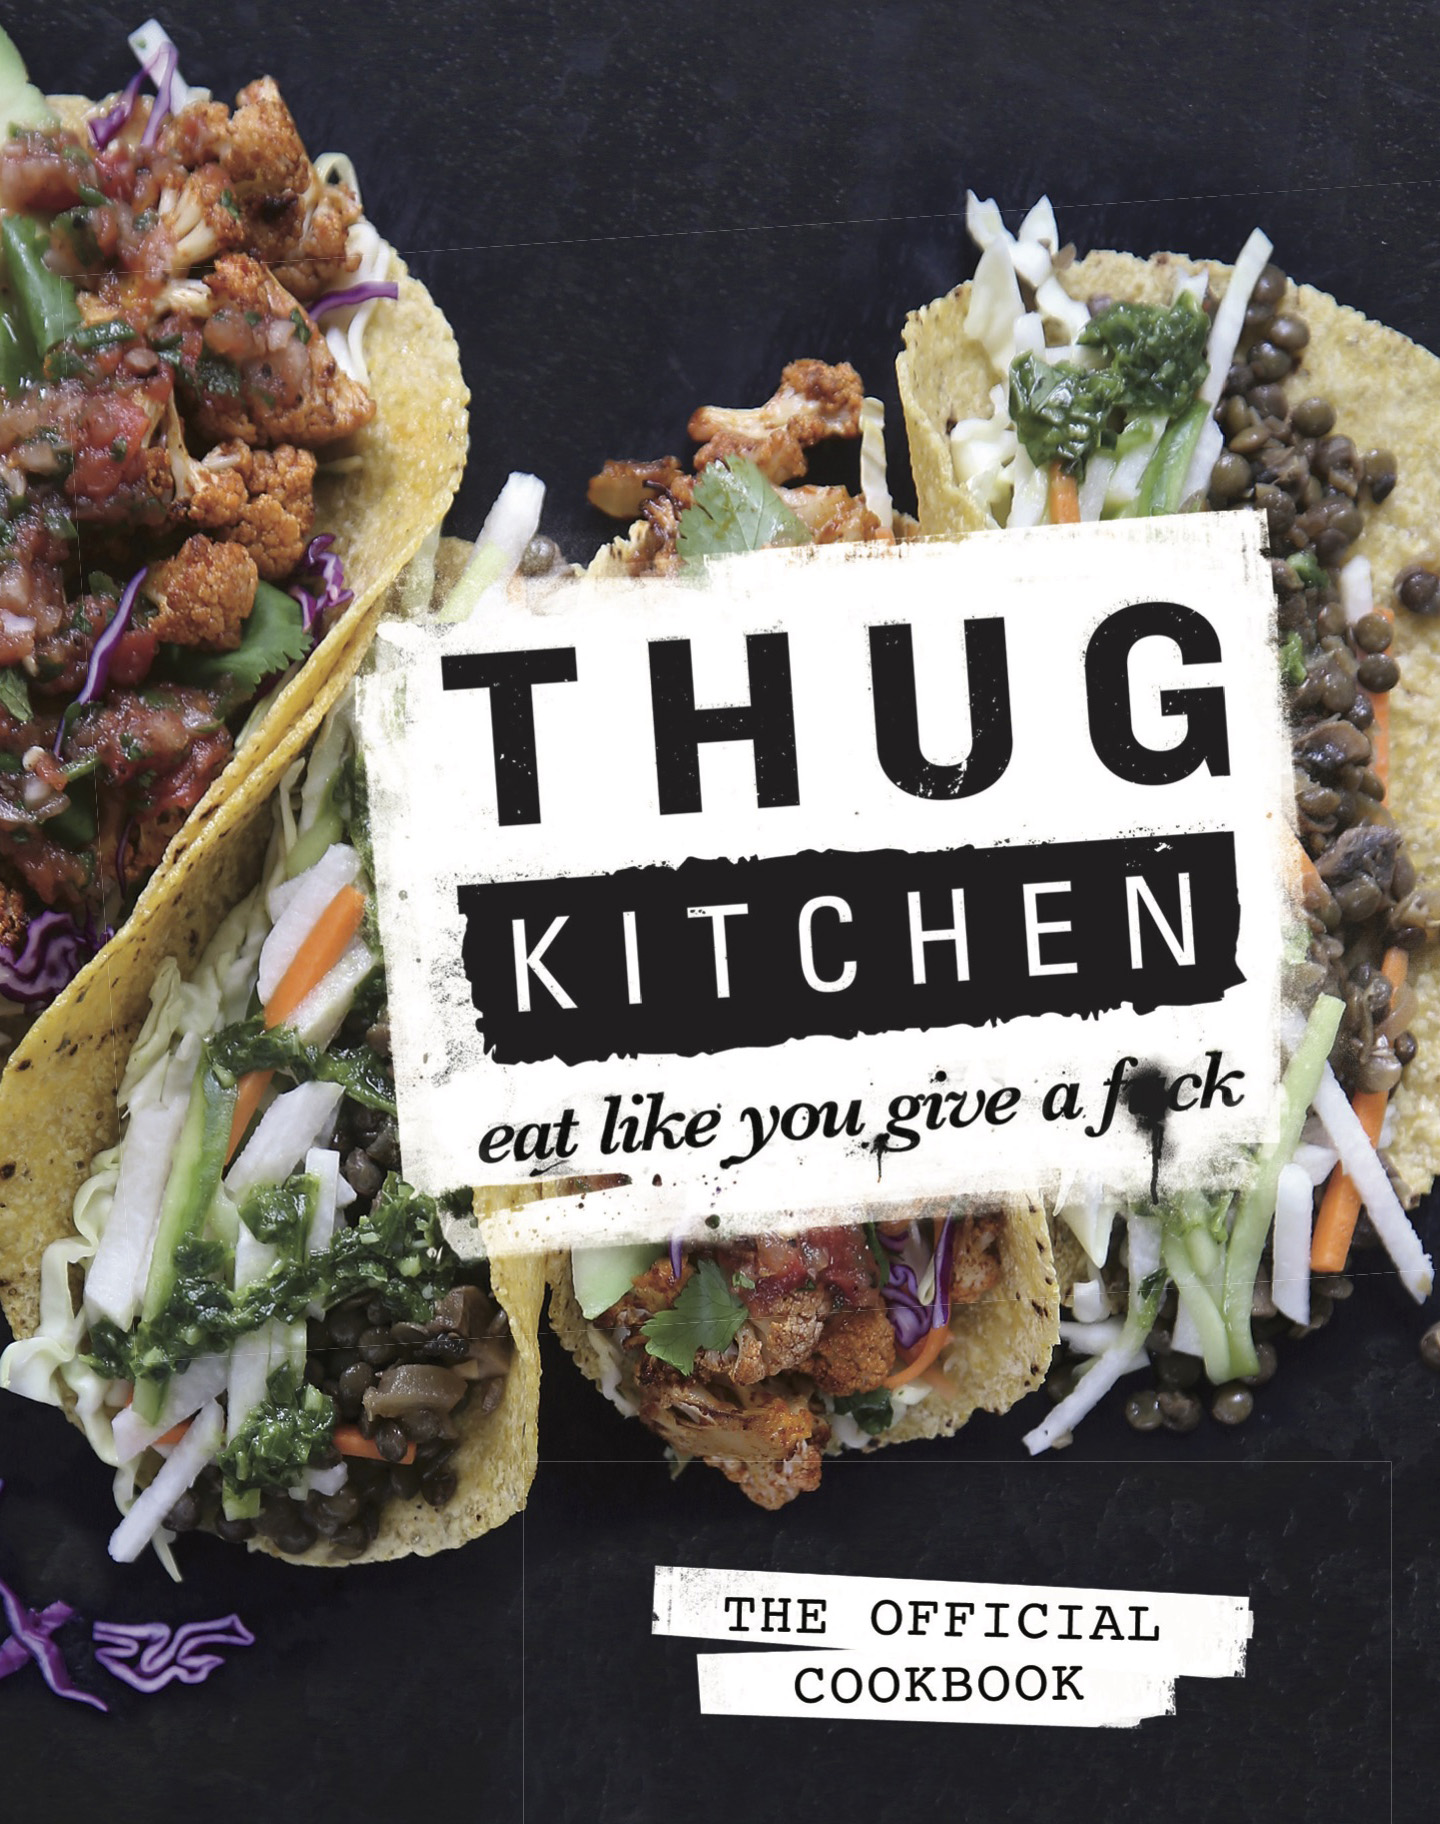 Rodale - Thug Kitchen - 9781623363598.jpg